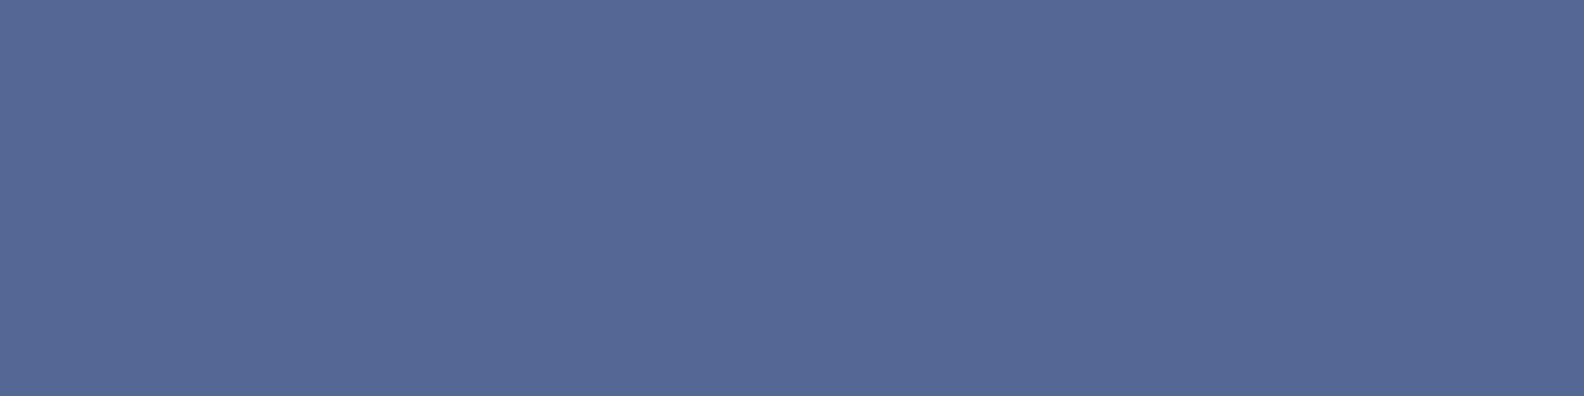 1584x396 UCLA Blue Solid Color Background